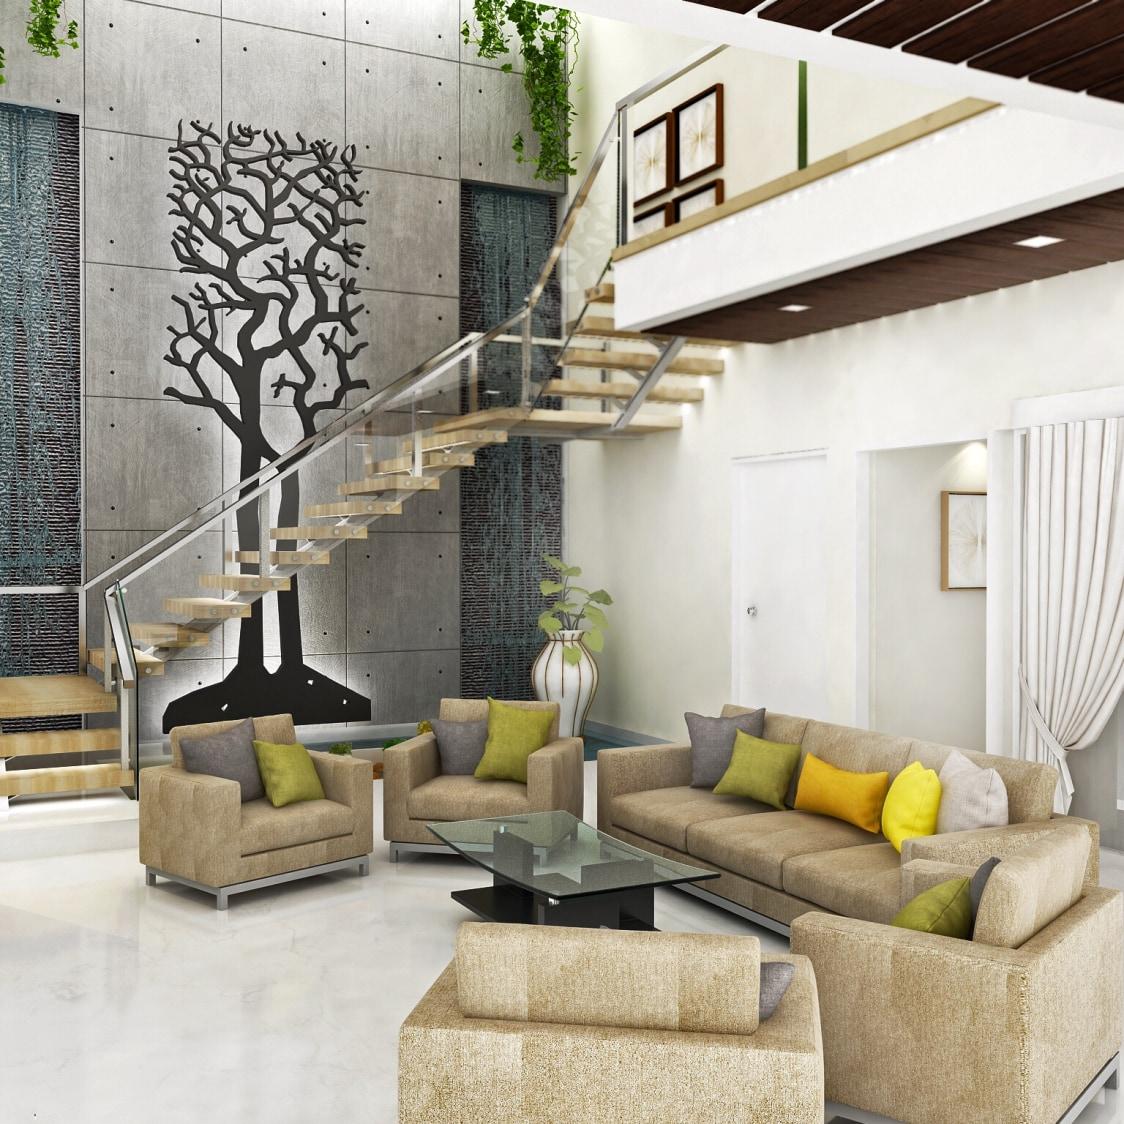 Rustic living room by setu.patel Living-room | Interior Design Photos & Ideas